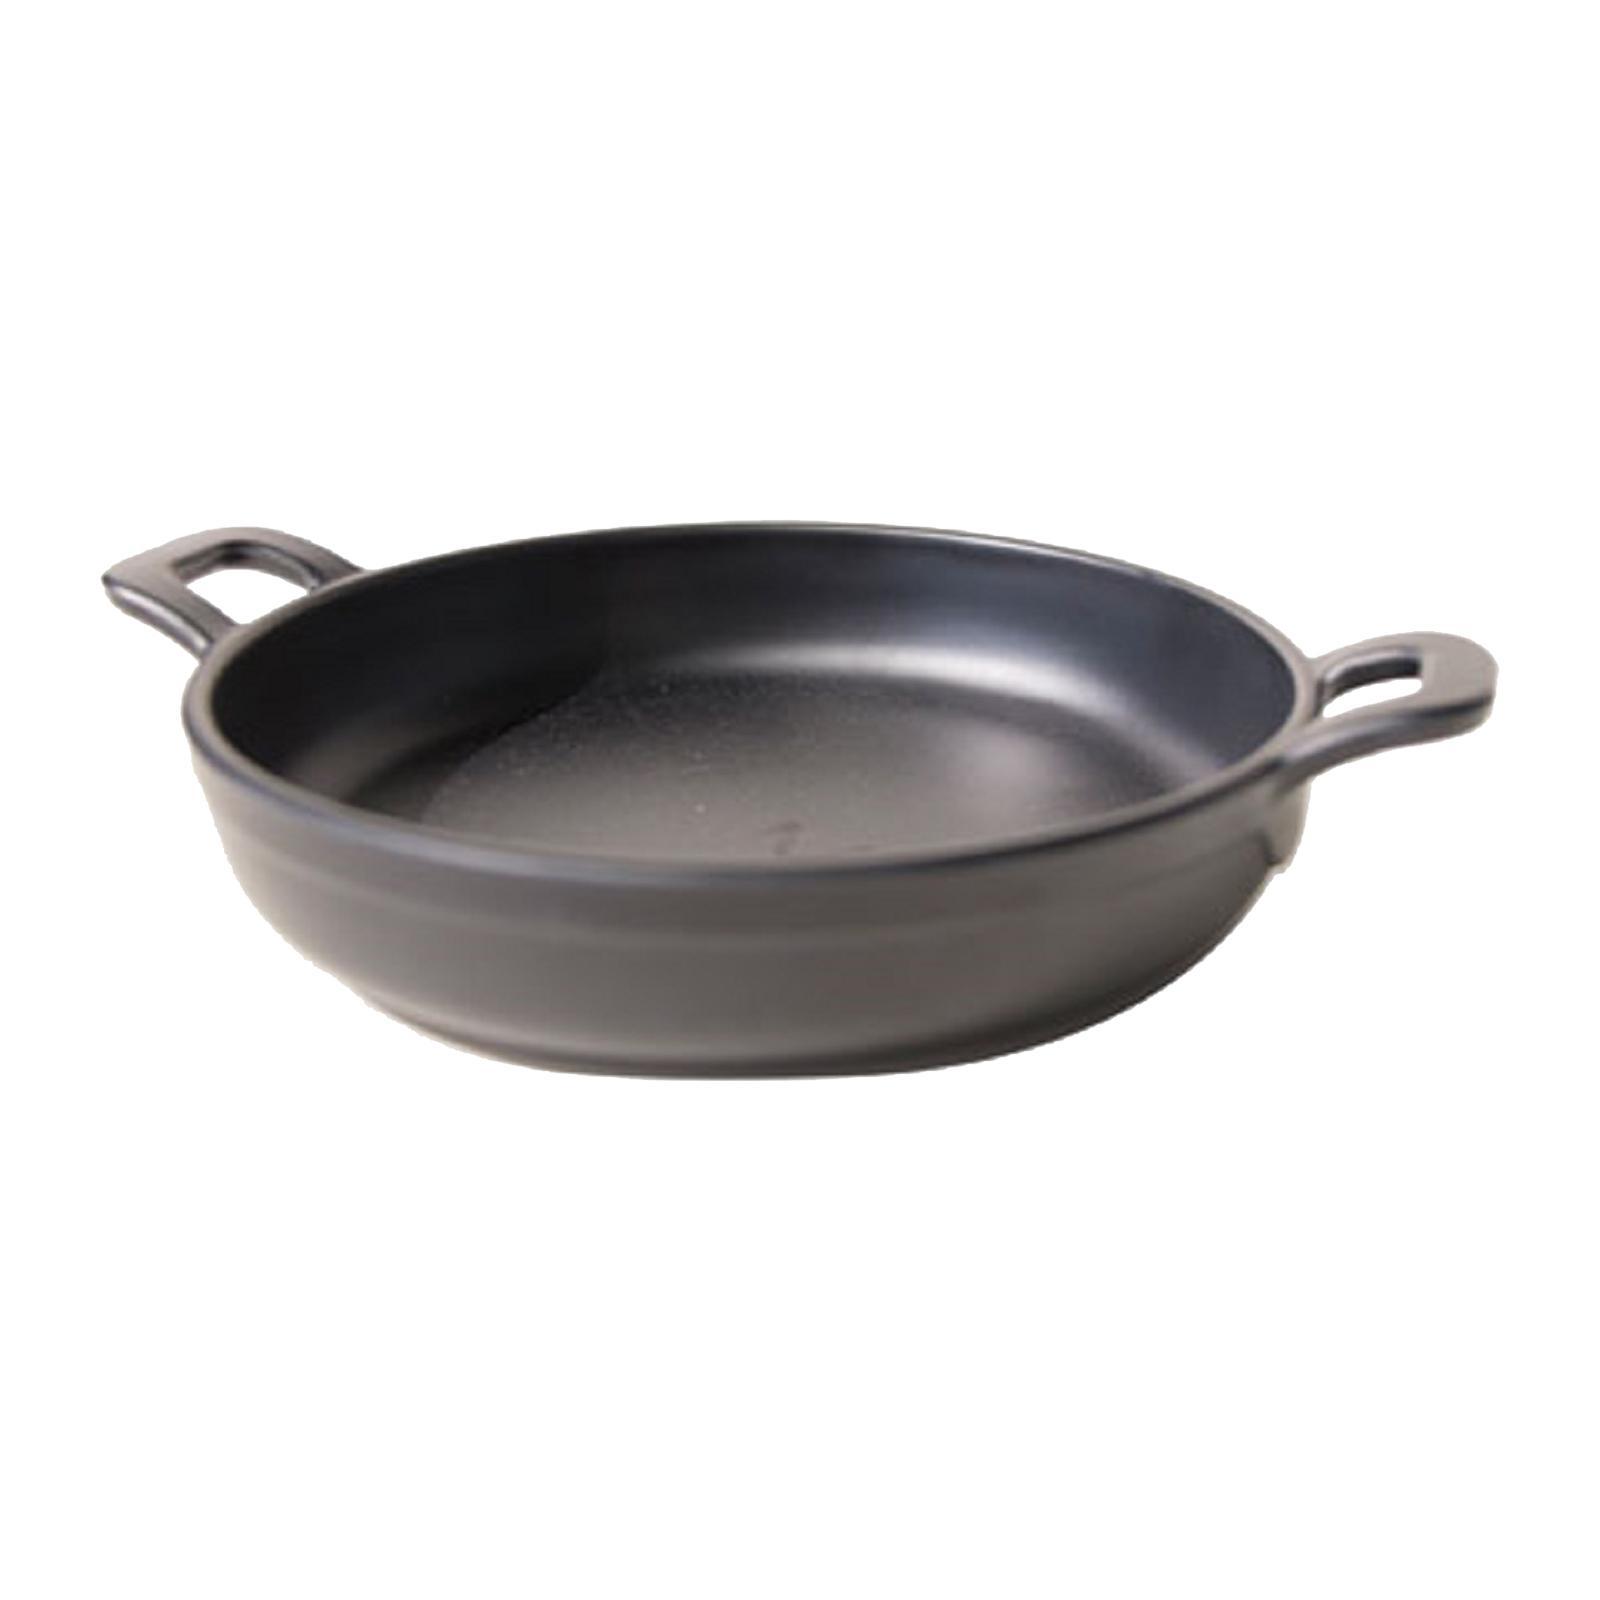 Efay Melaime 5 Inch Mini Round Pan - Black